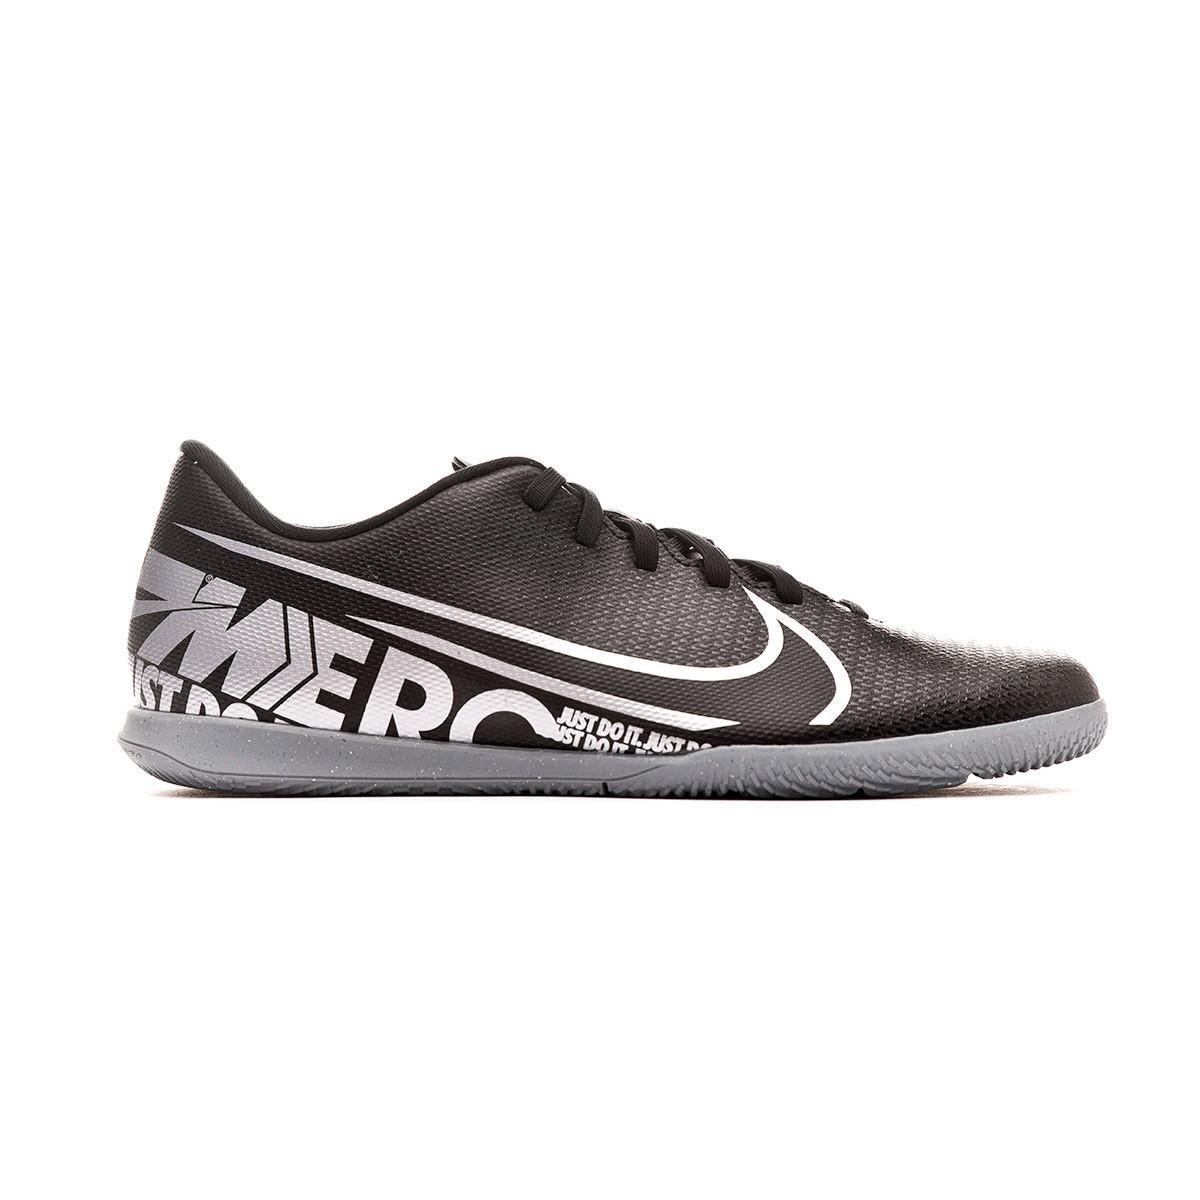 28dbcbff2d917 Futsal Boot Nike Mercurial Vapor XIII Club IC Black-Metallic cool grey -  Football store Fútbol Emotion